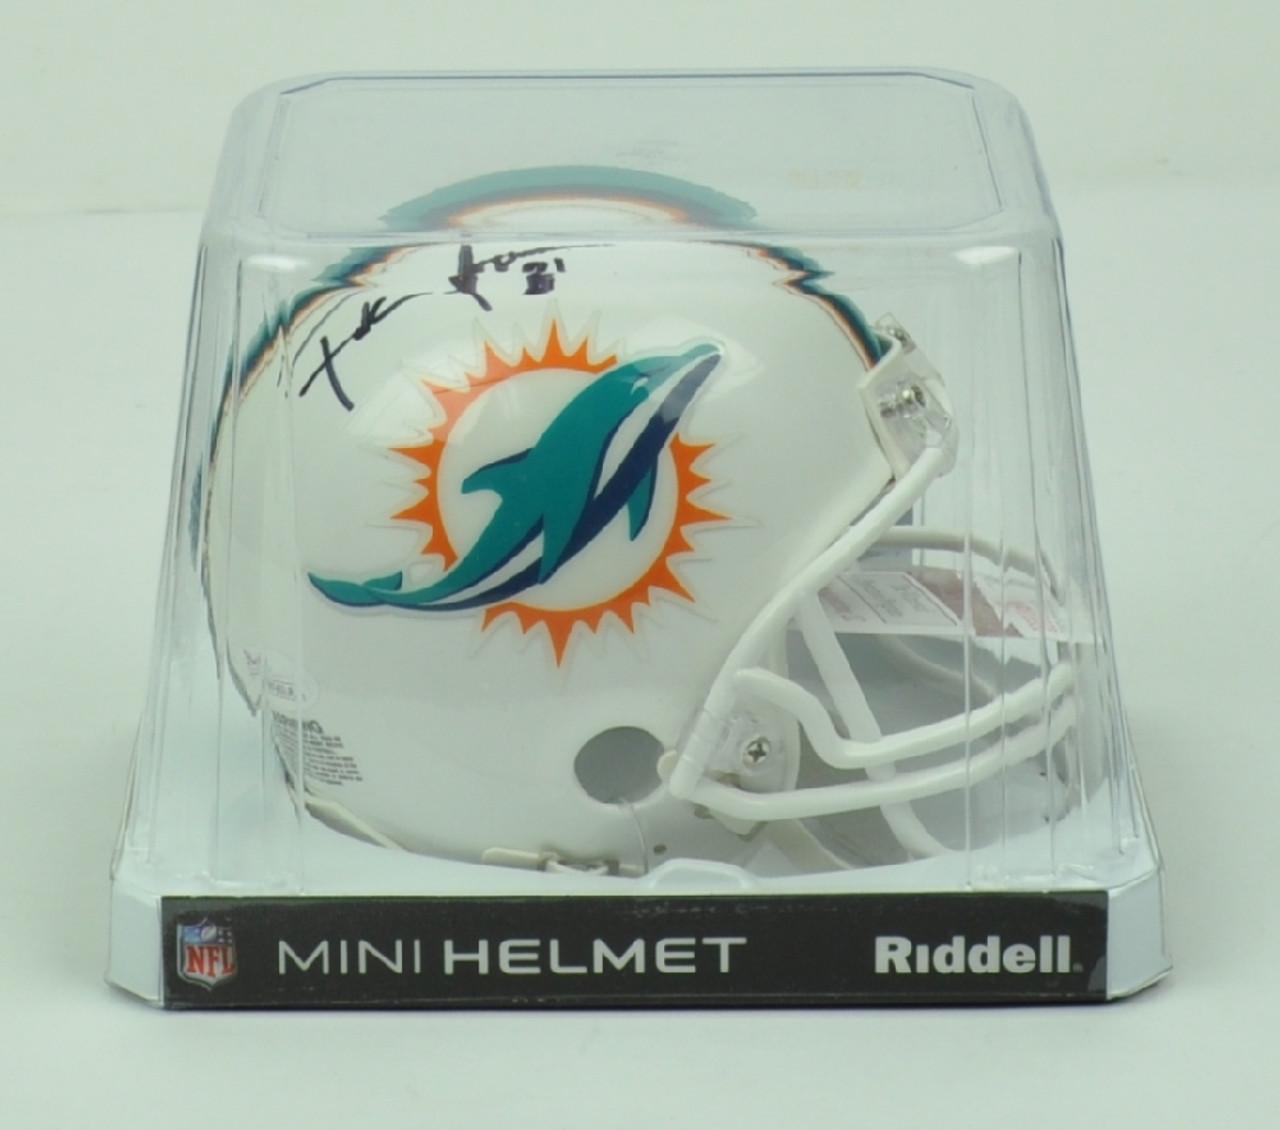 NFL Miami Dolphins Running Back Frank Gore 3 Signed Autographed Riddell  Mini Helmet JSA b4dcbc5e2